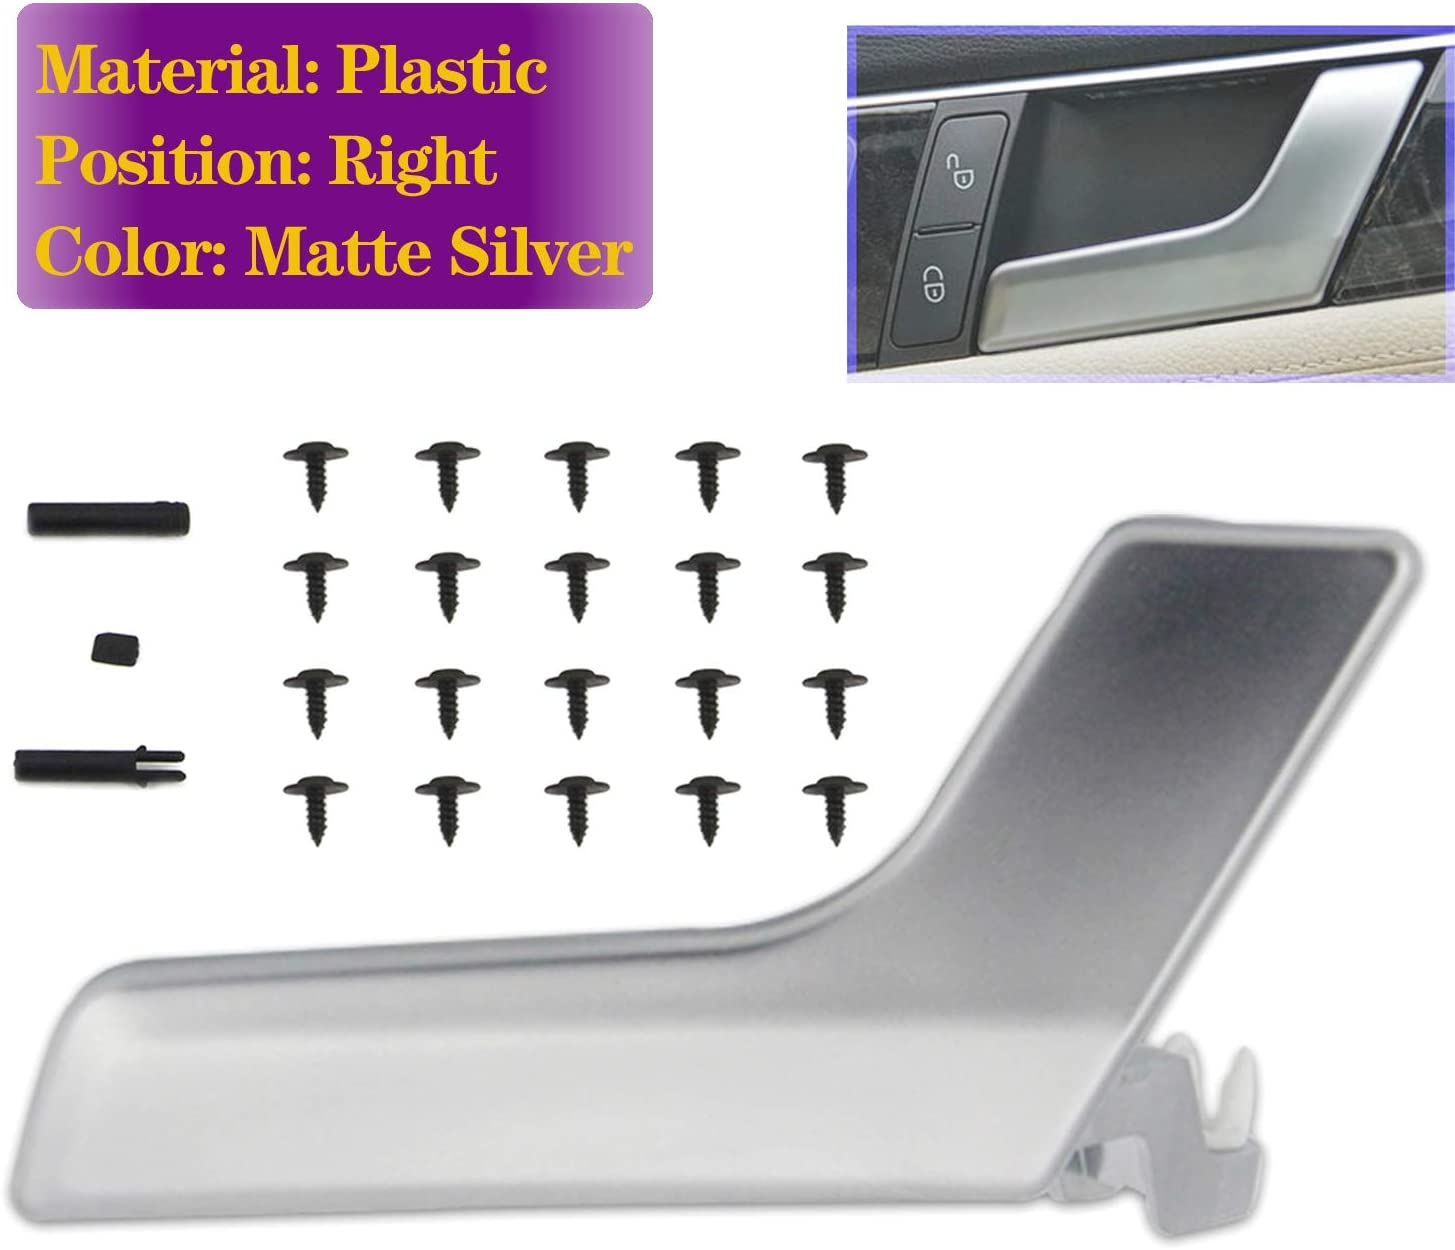 Aluminum Alloy FEXON Interior Door Handle Repair Kit Left Side Replacement for Mercedes-Benz W204 C230 C250 C280 C300 C350 C400 C63 AMG X204 GLK250 GLK280 GLK300 GLK350 Shiny Silver 2047201171